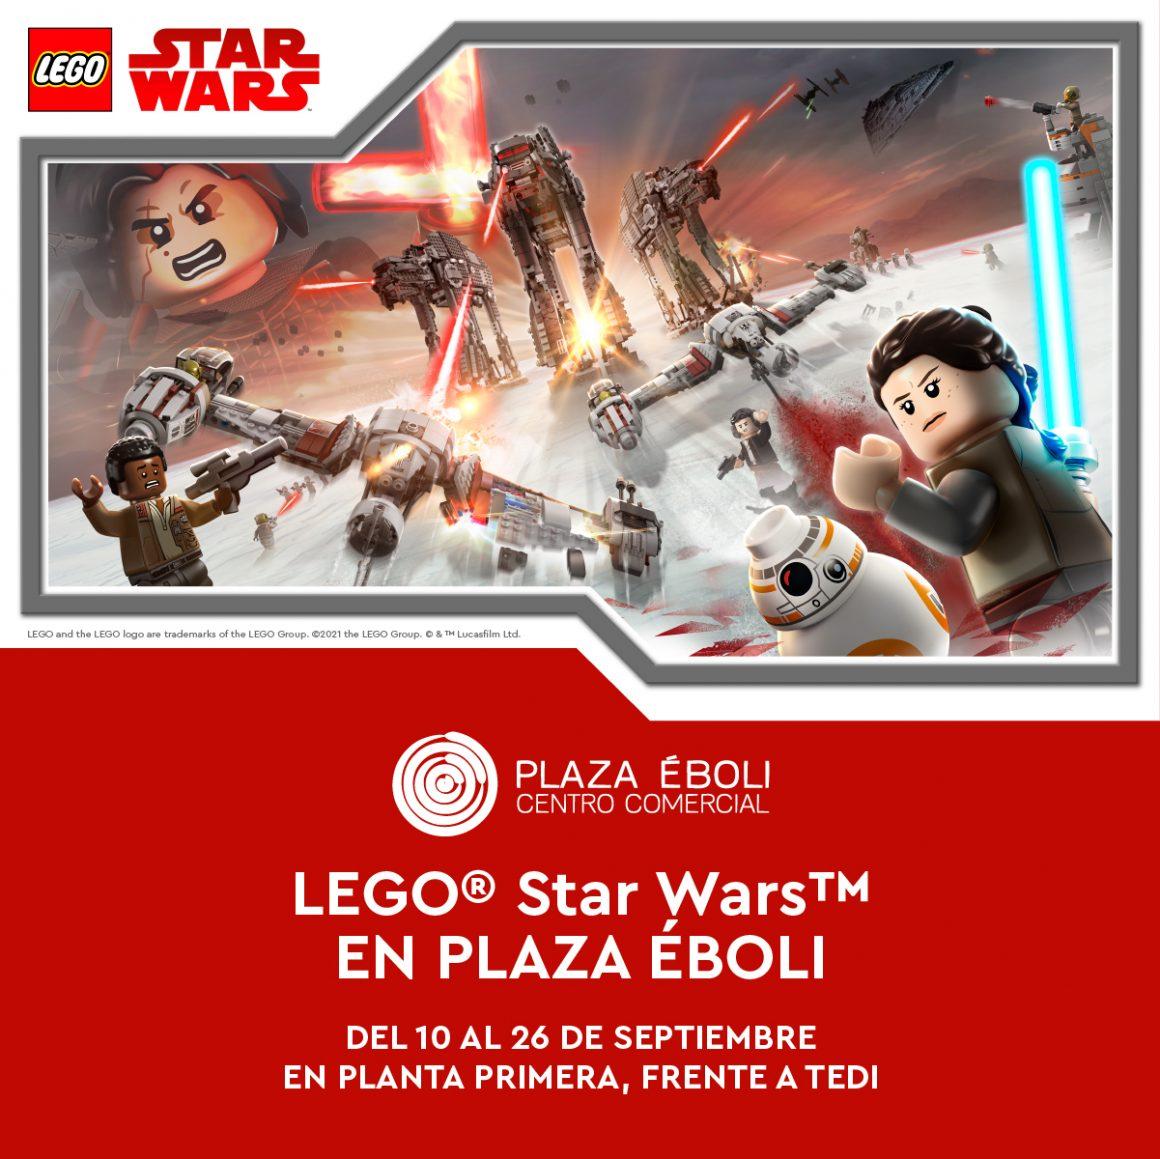 ¡VISITA LEGO STAR WARS!